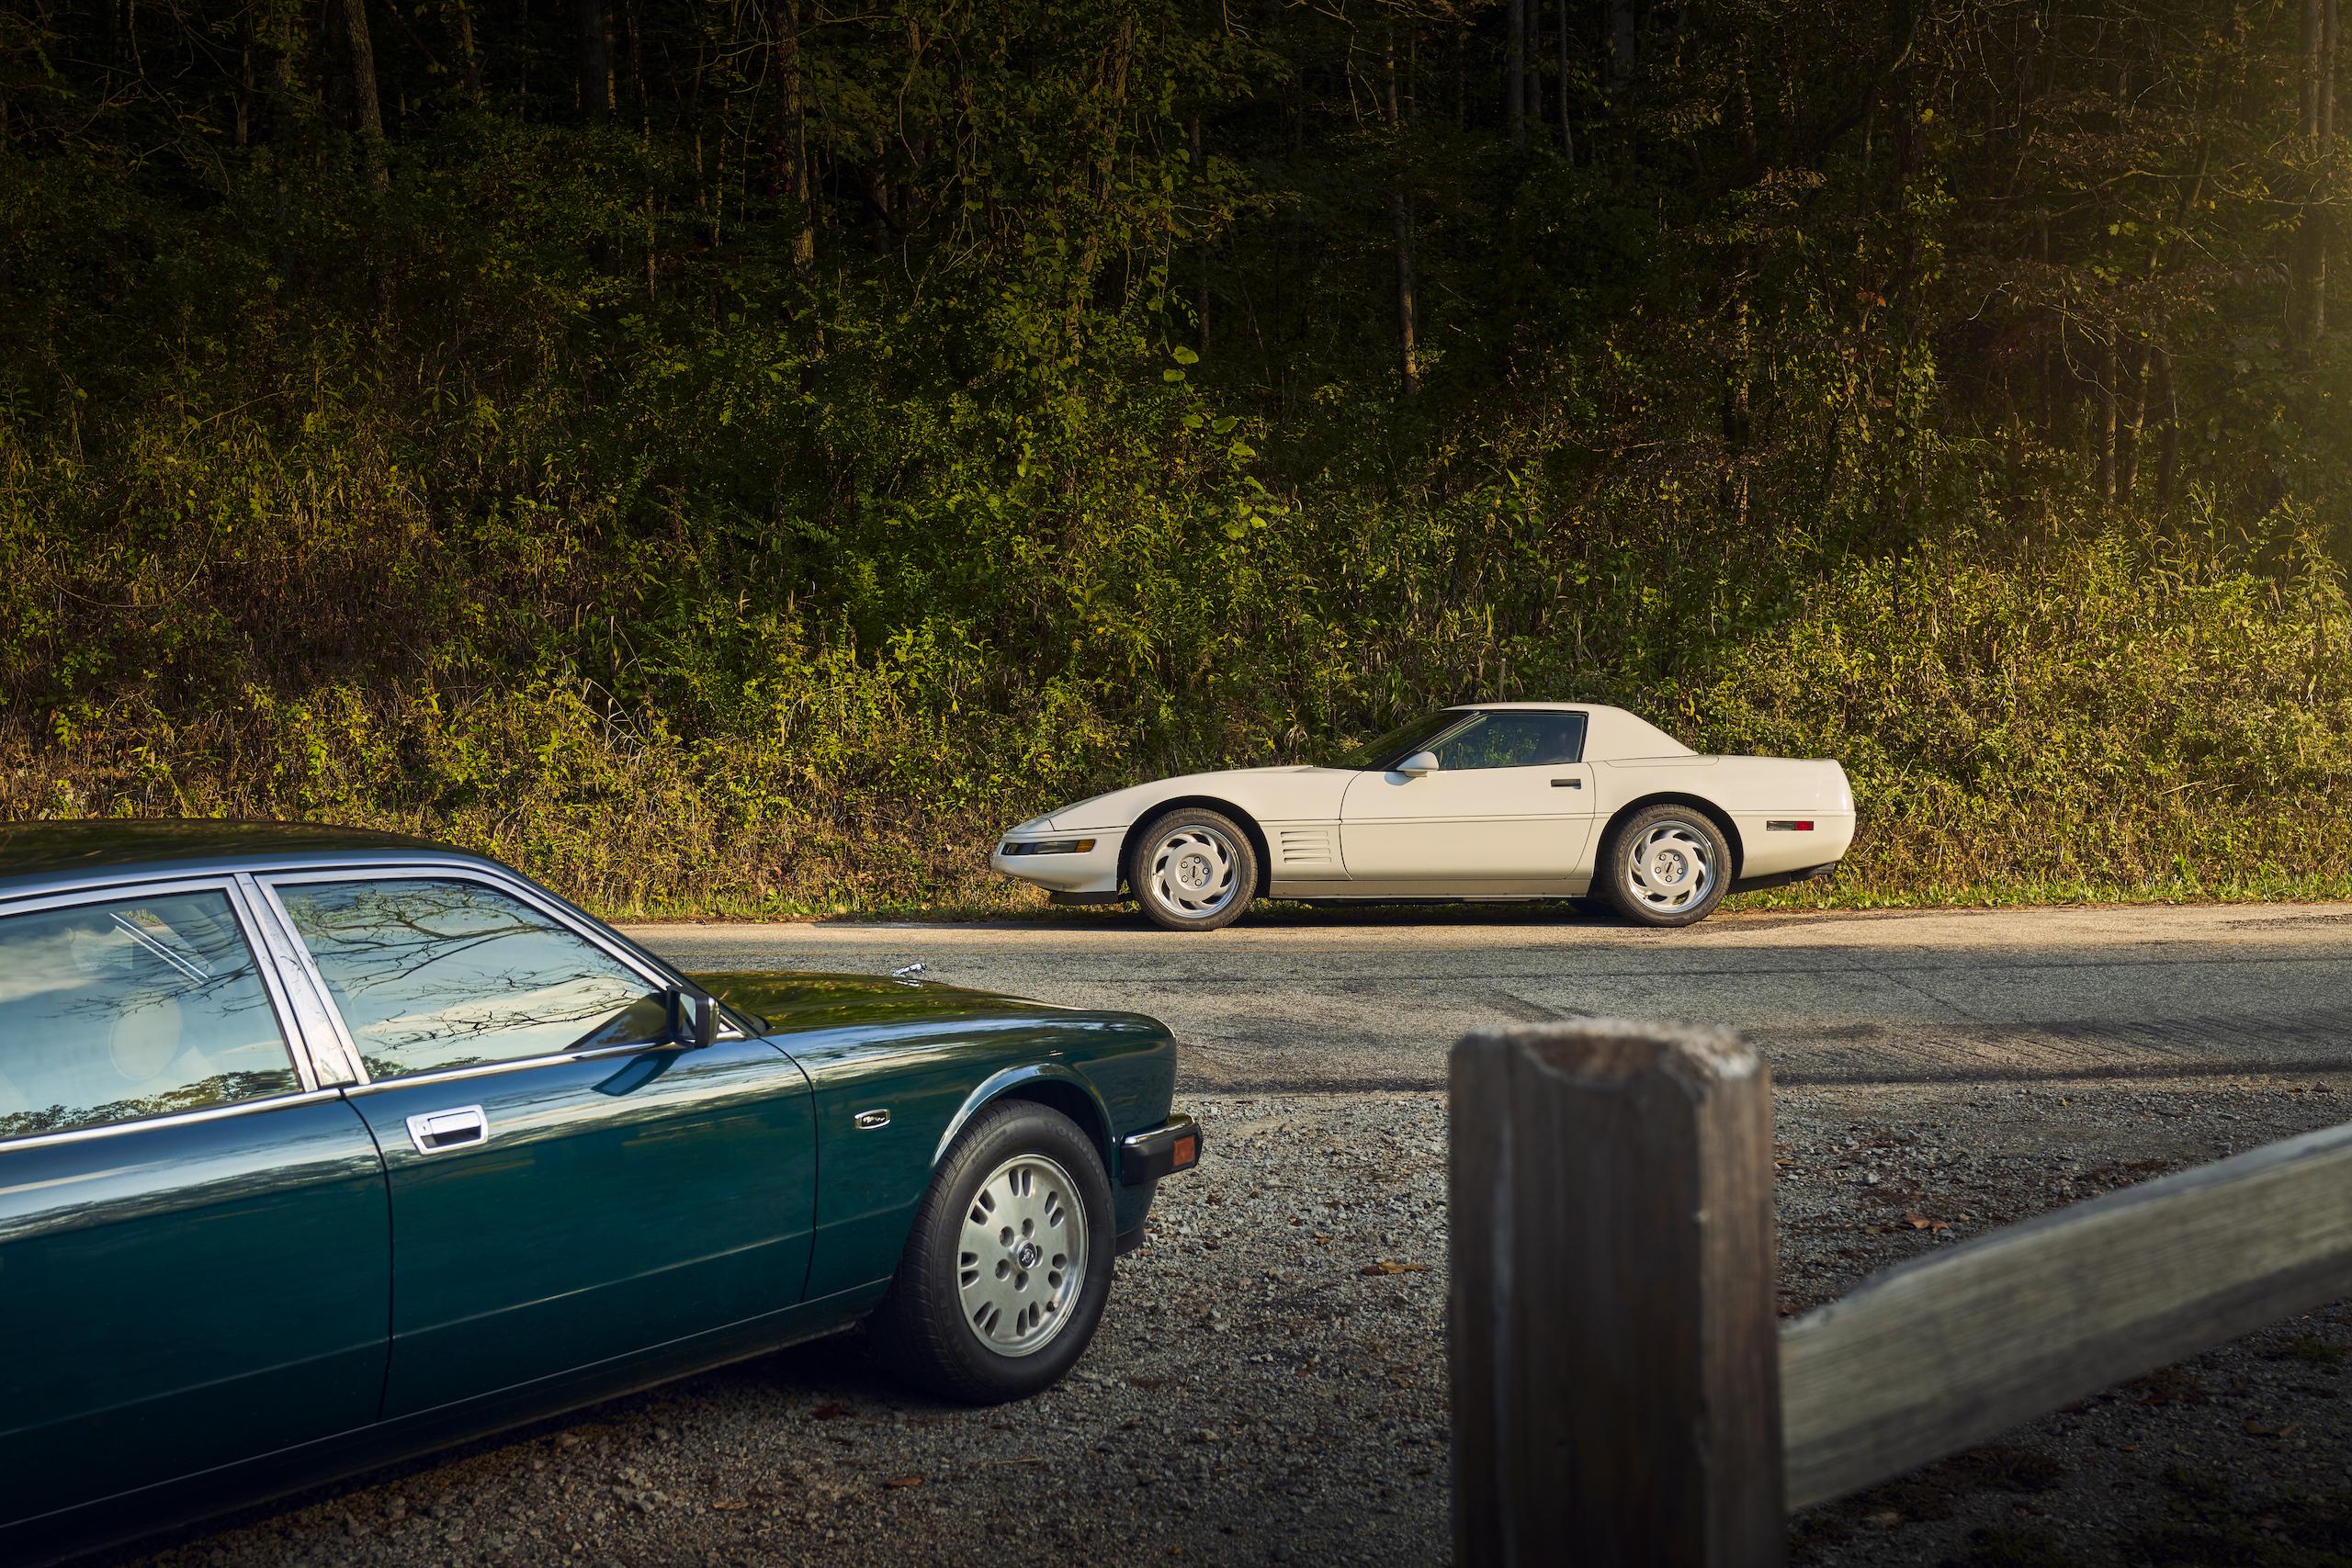 C4 Corvette and Jaguar XJ6 still